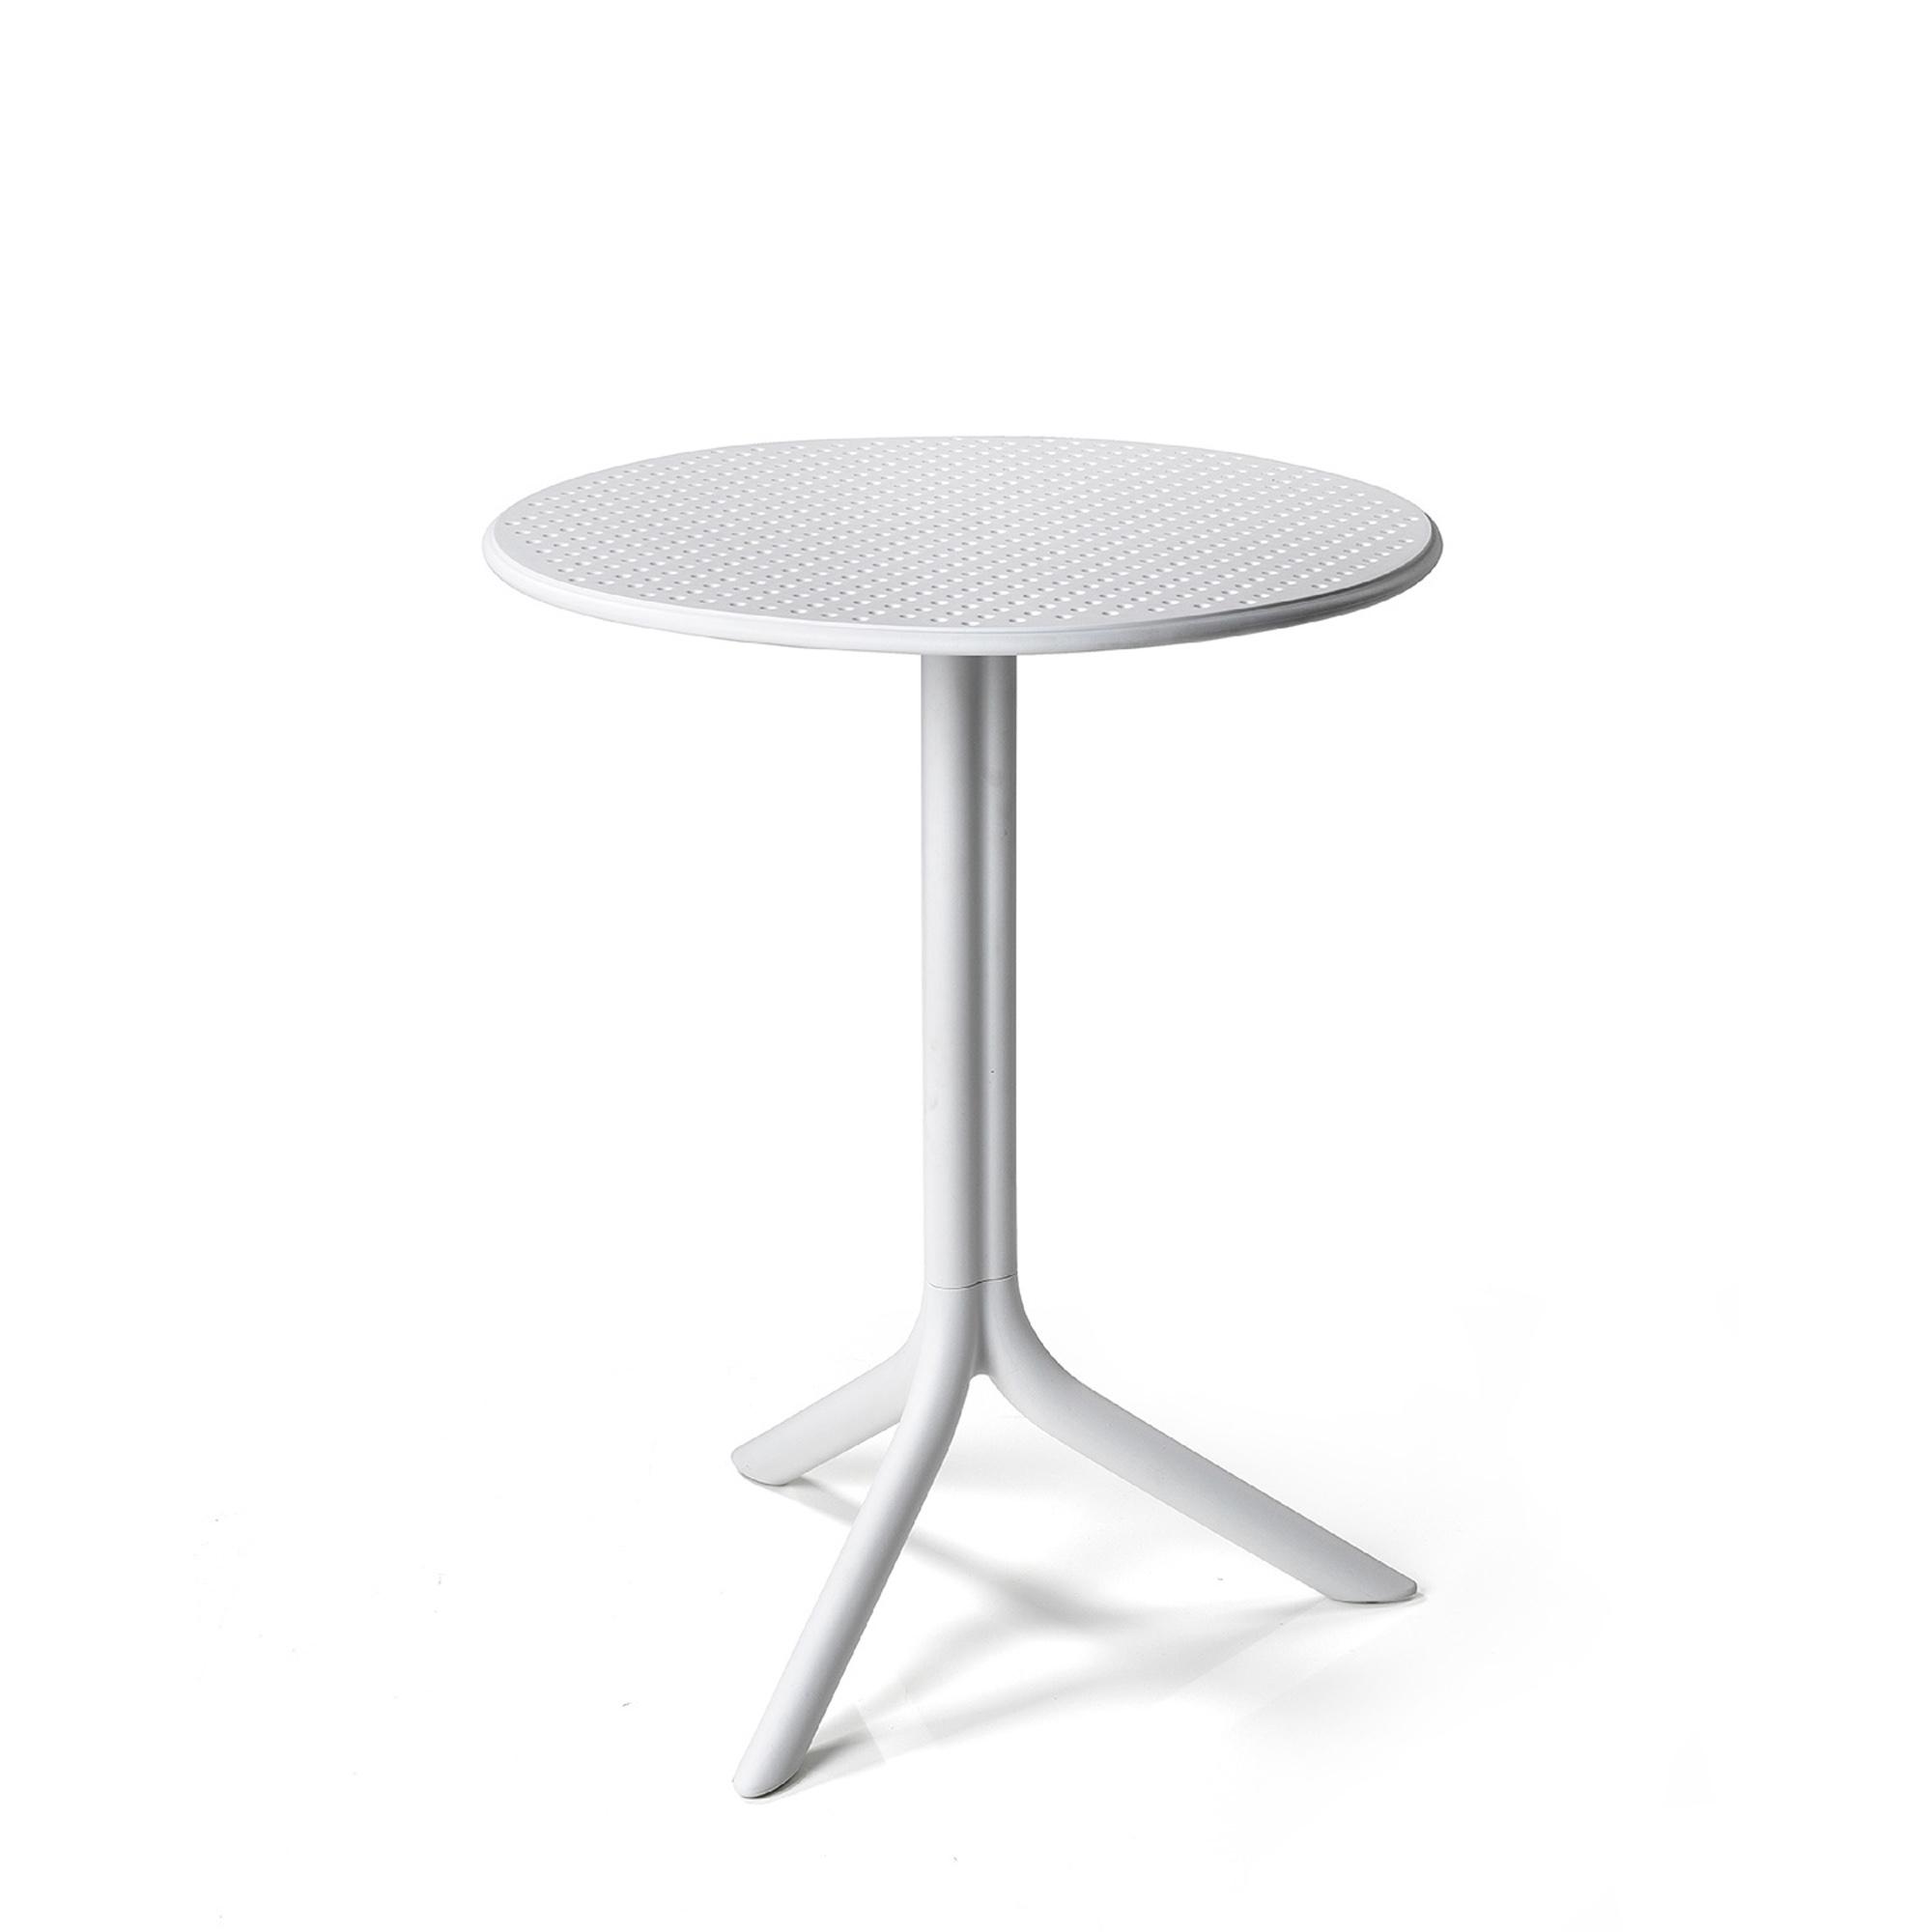 STEP TABLE WHITE PROFILE WS1